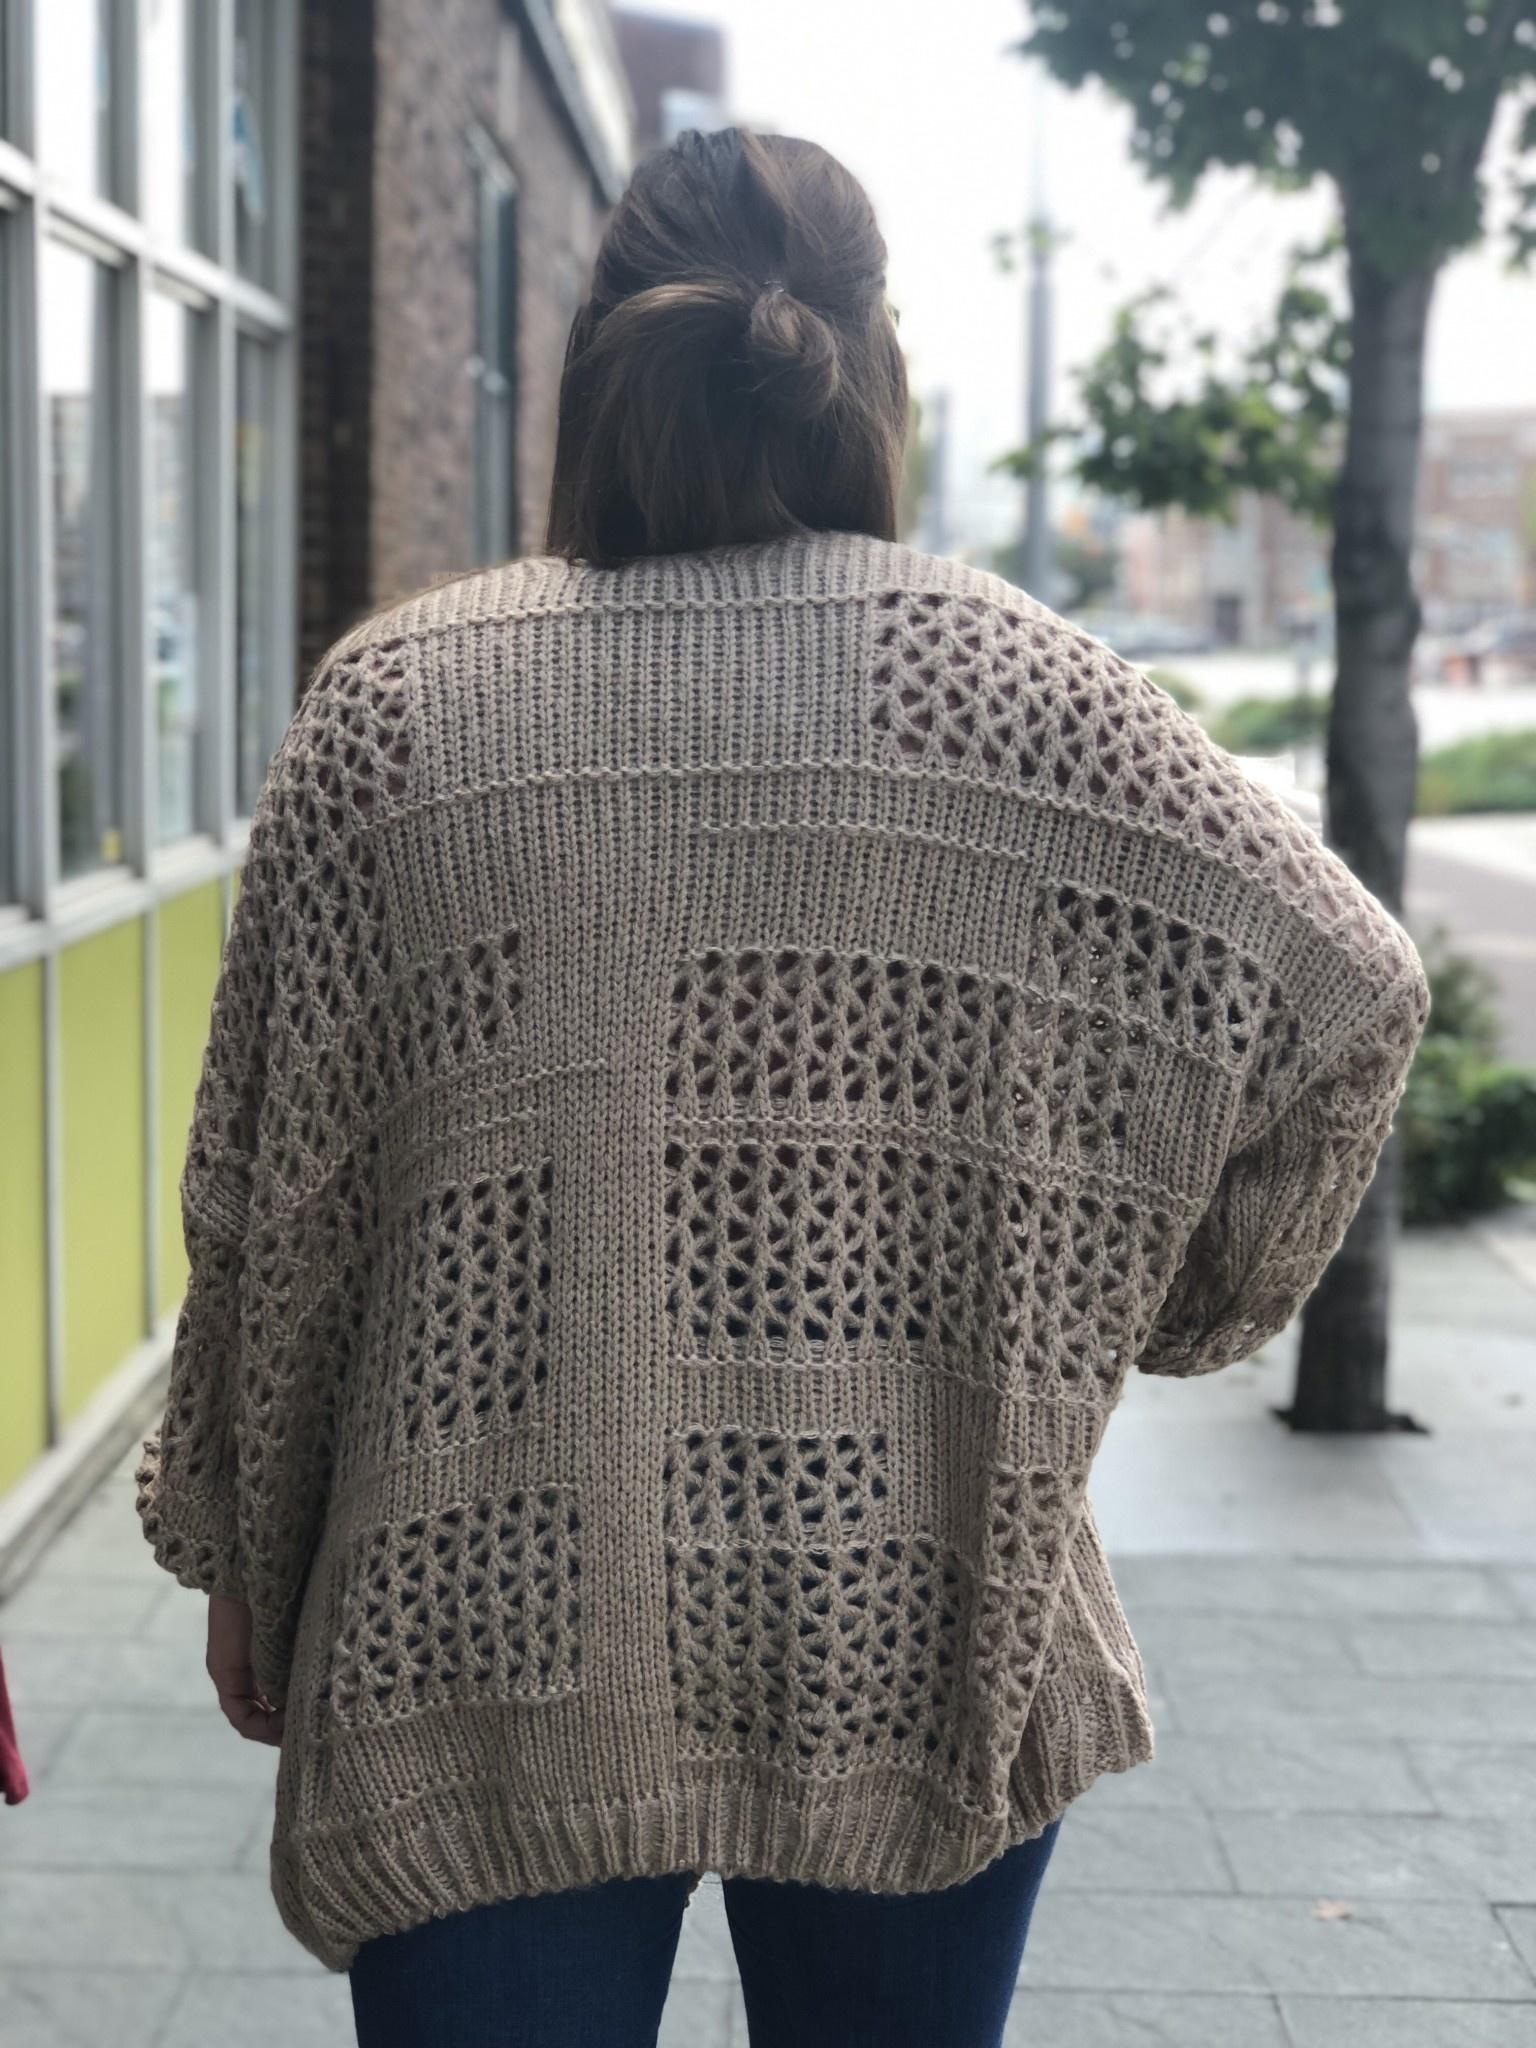 Oversized Taupe Knit Cardigan